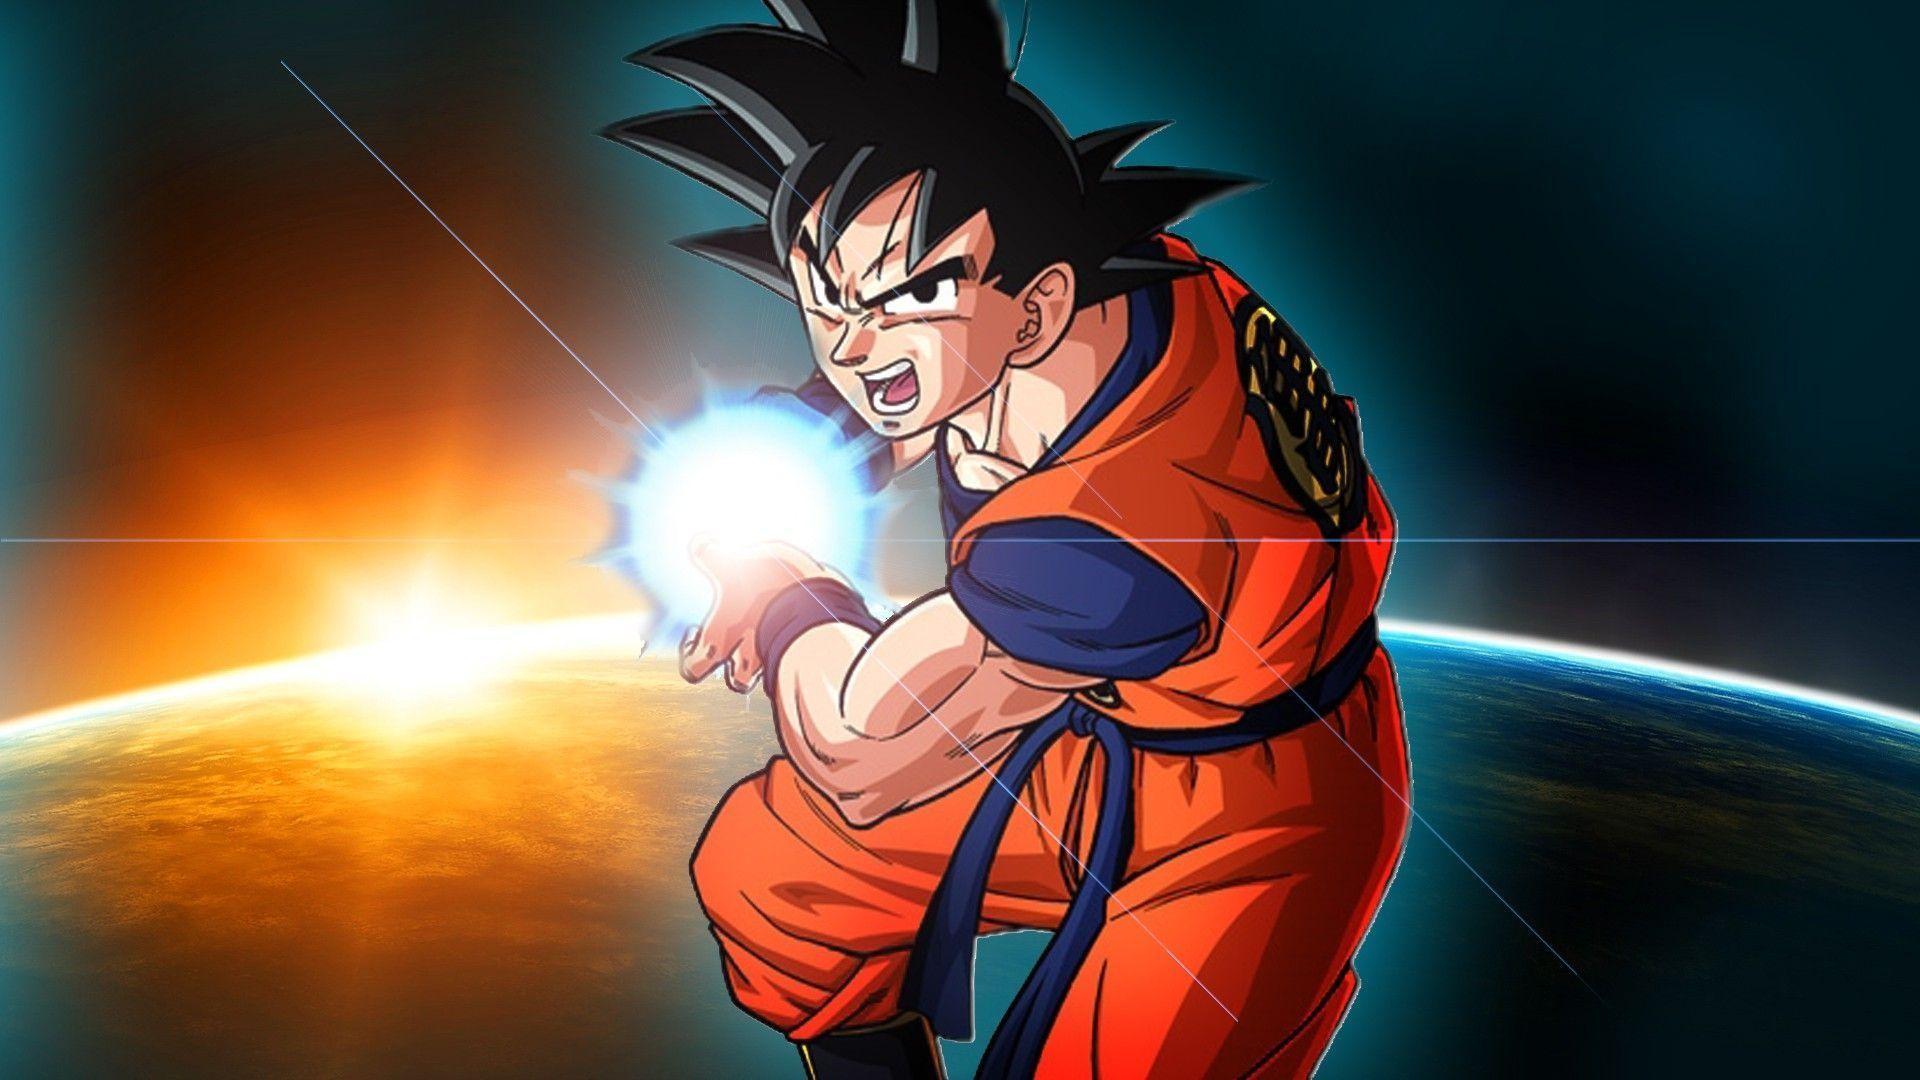 Goku Kamehameha Dragon Ball Z Wallpaper   warnerboutique